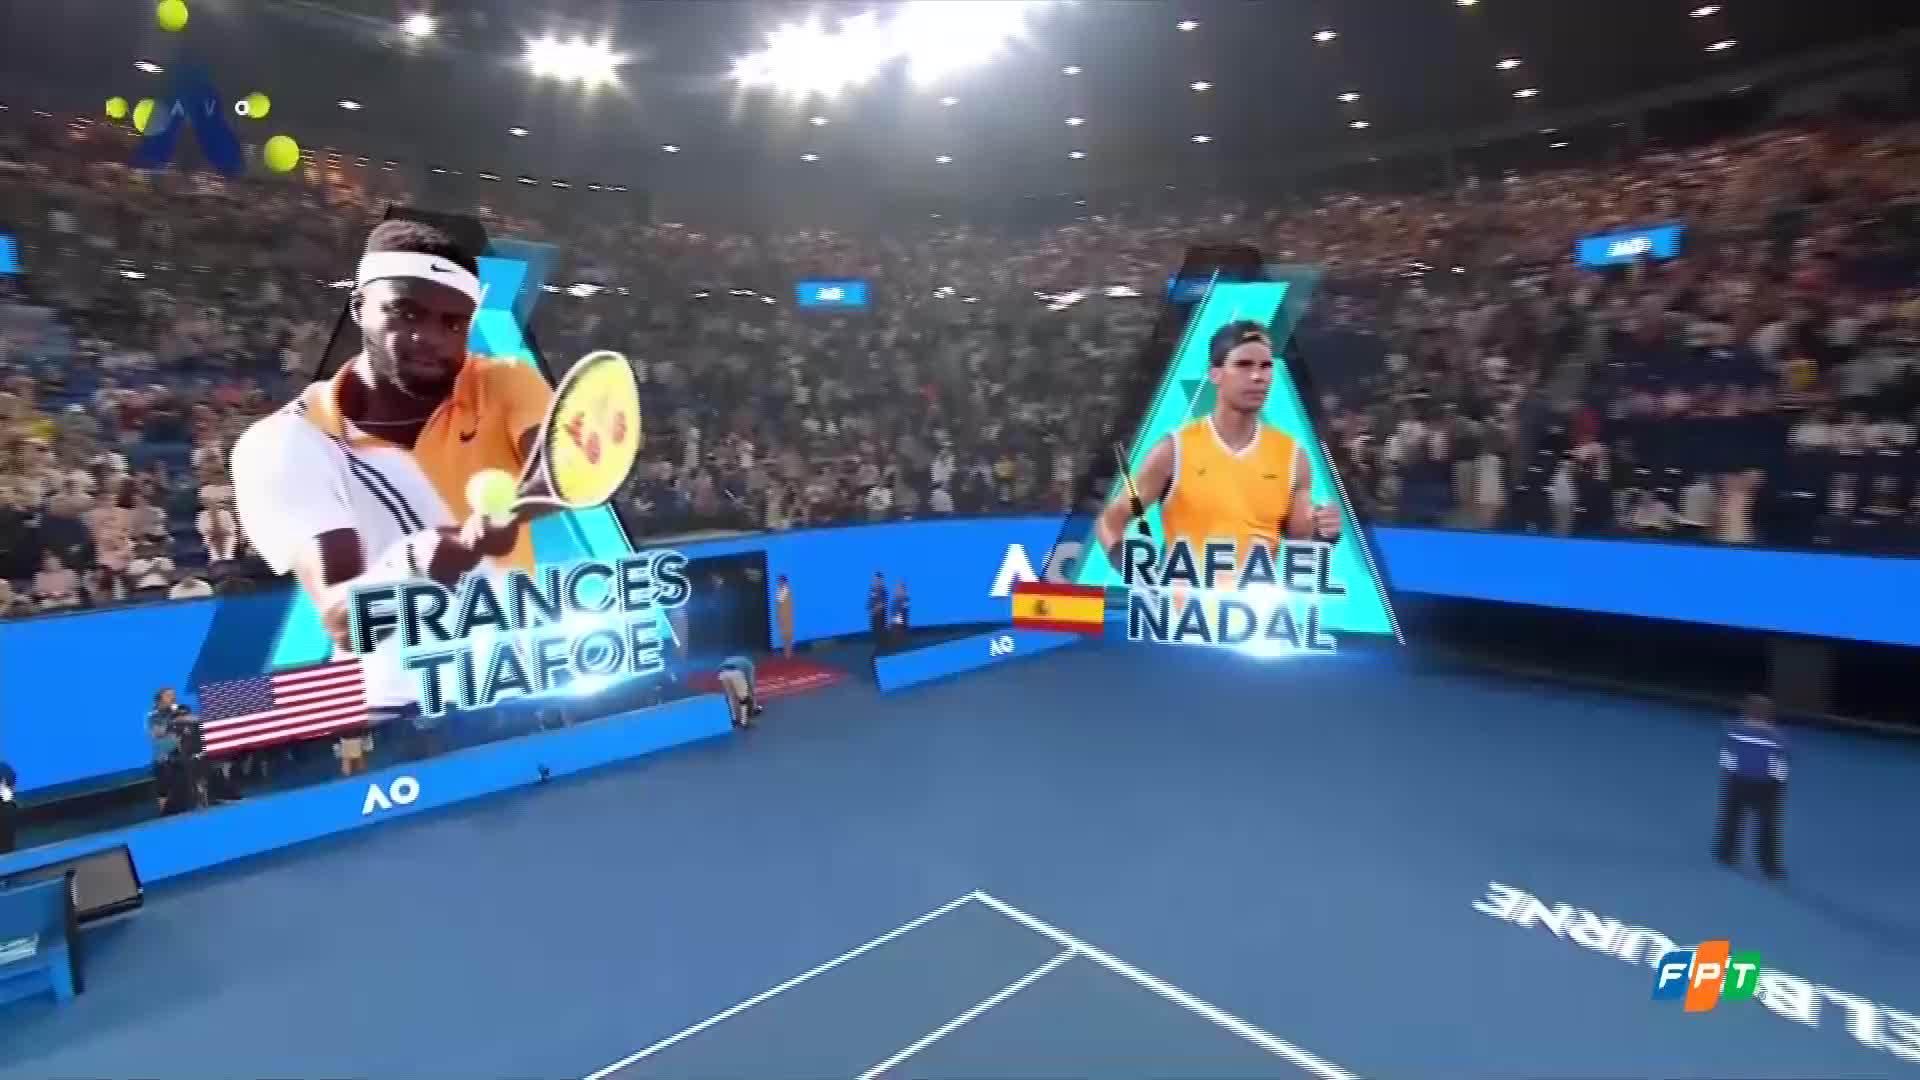 Frances Tiafoe 3-0 Rafael Nadal